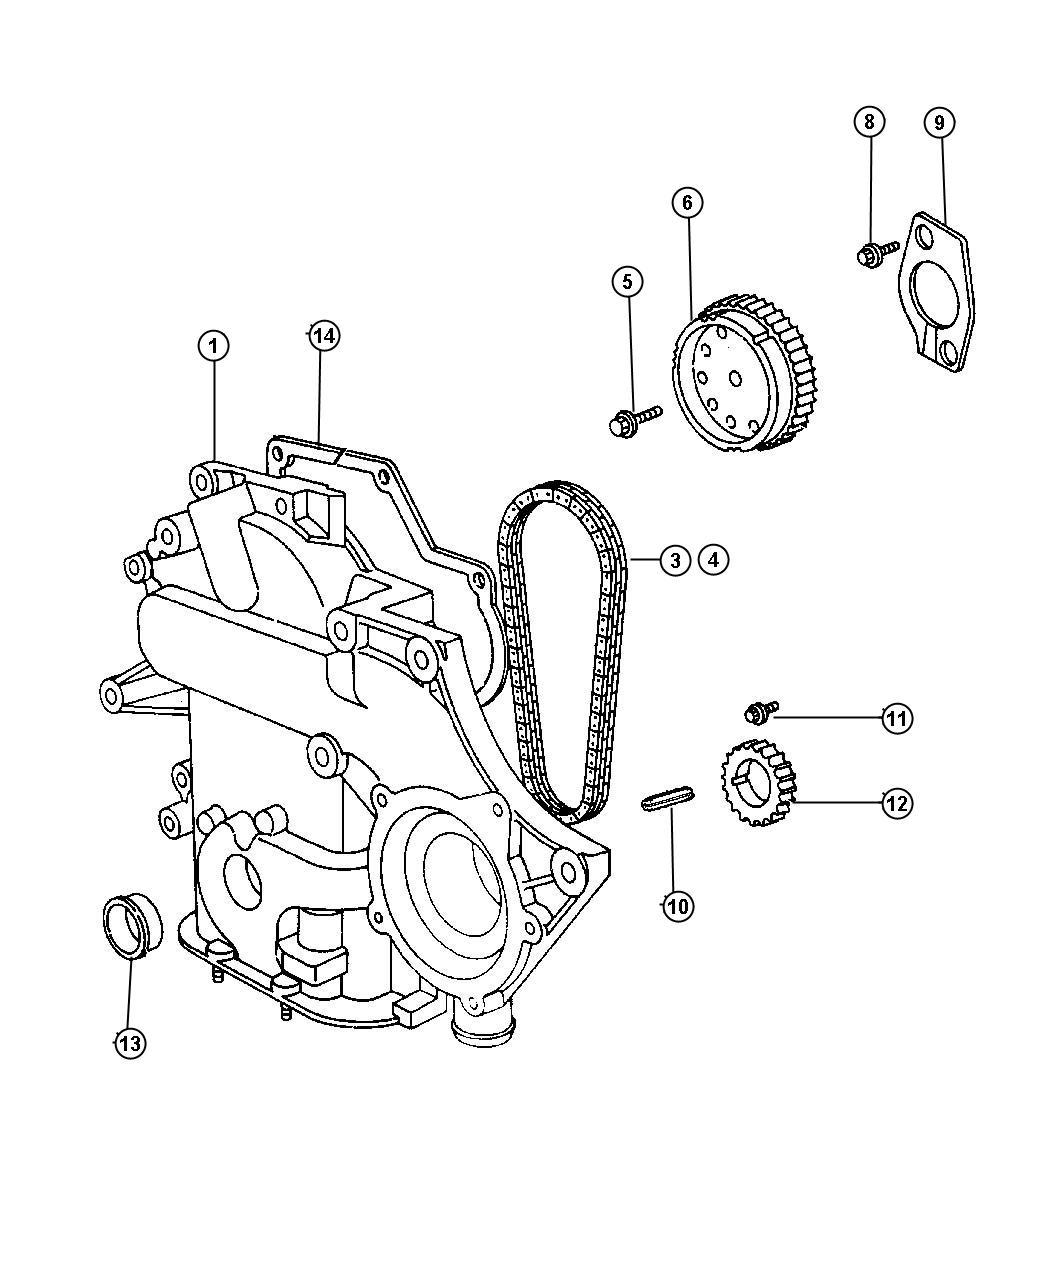 Dodge Grand Caravan Timing Chain And Cover 3 8l Egh